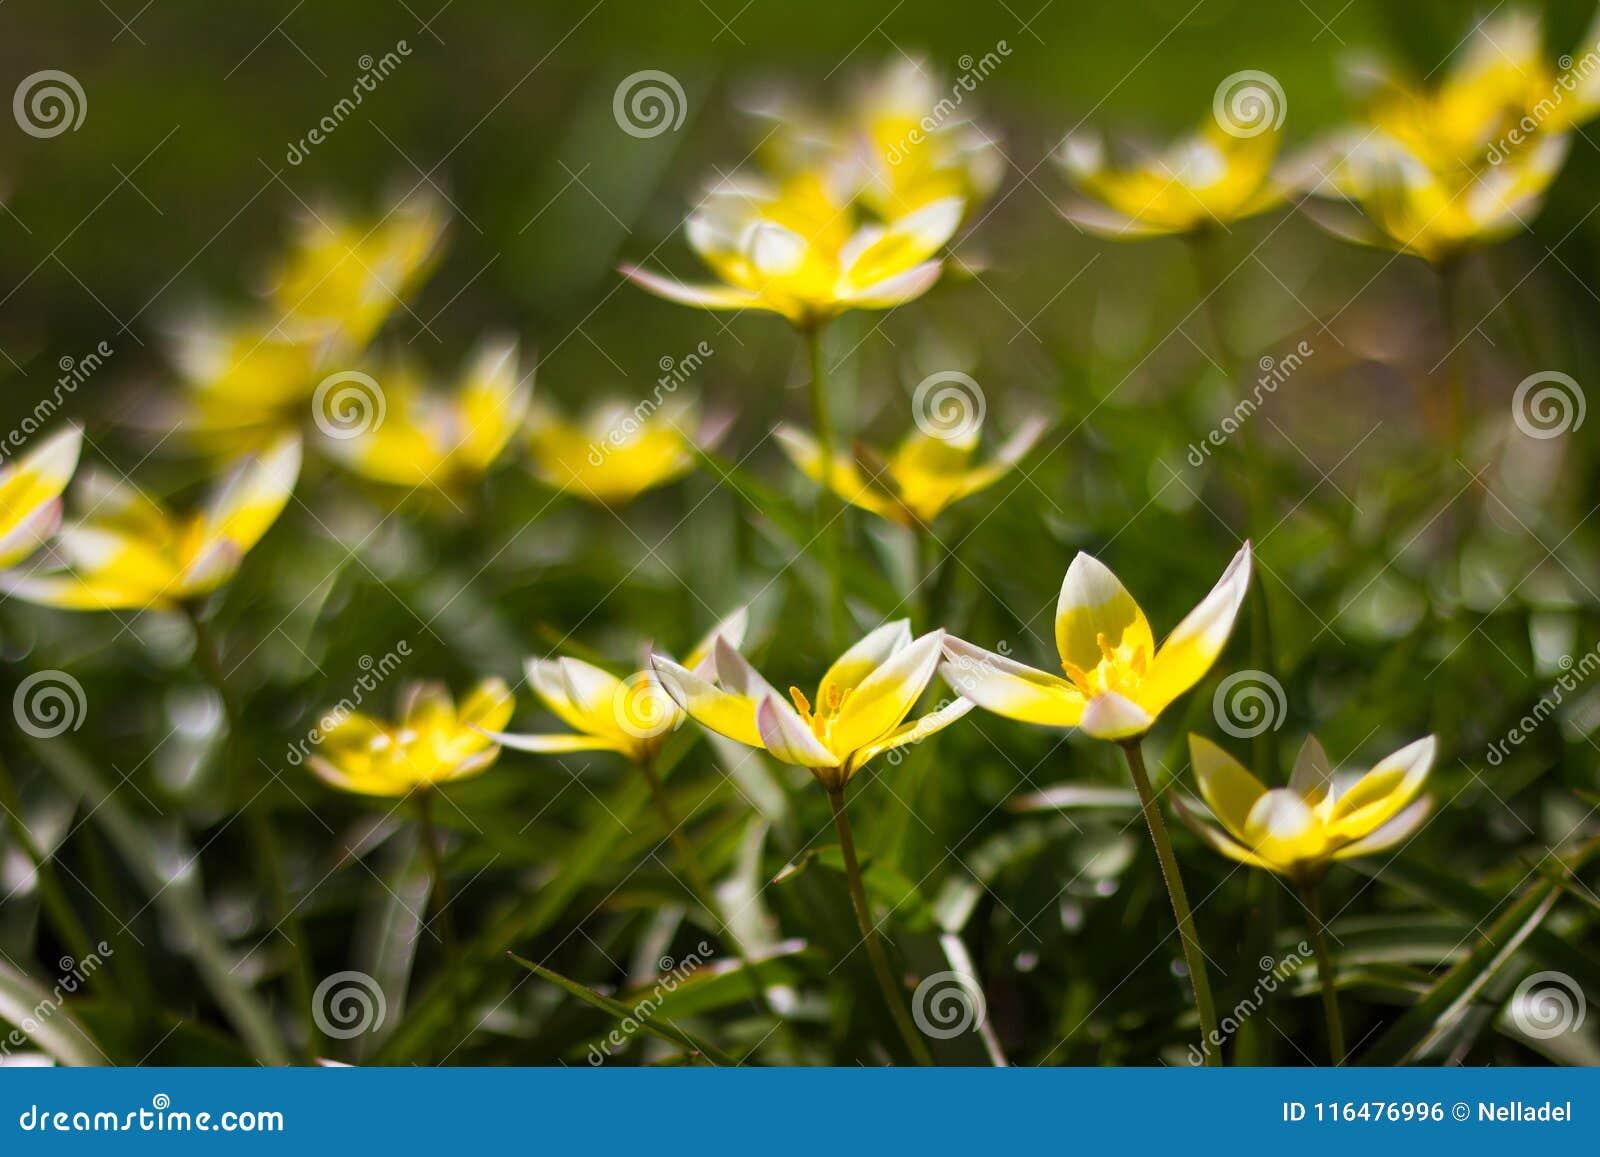 Small yellow flowers on flowerbed stock photo image of bright small yellow flowers on flowerbed mightylinksfo